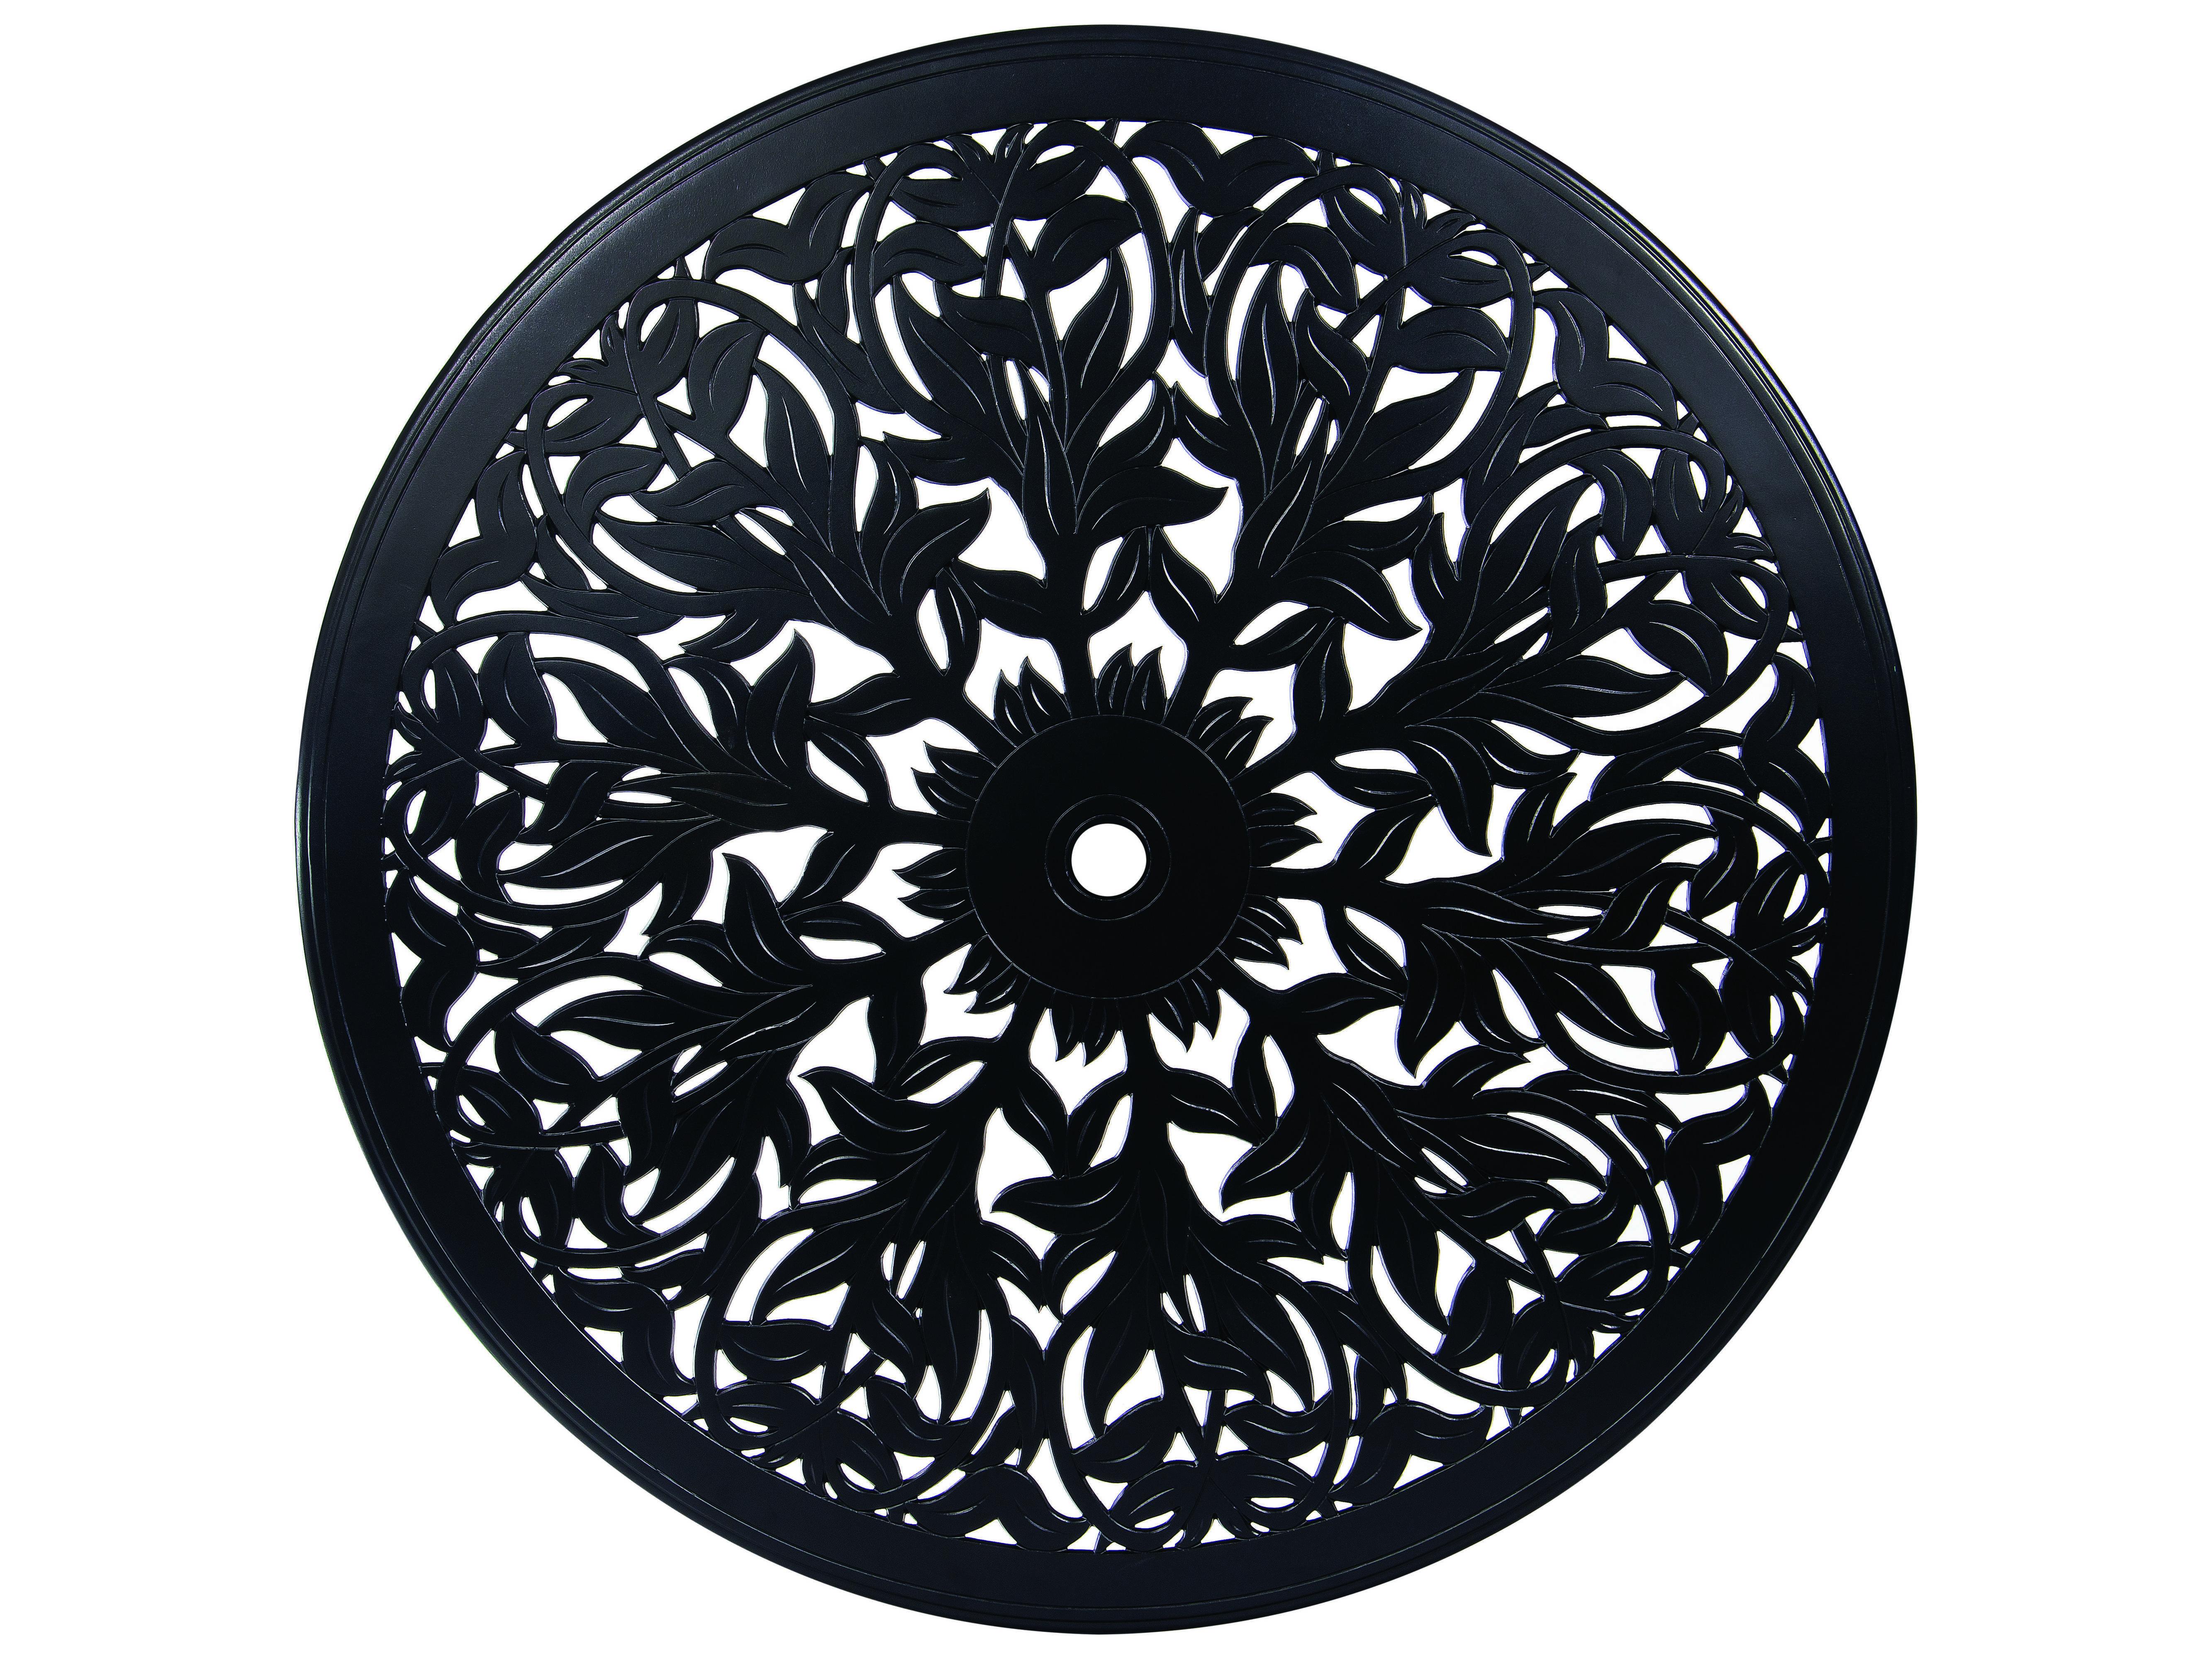 woodard cast aluminum napa 60 round table top with umbrella hole 03160. Black Bedroom Furniture Sets. Home Design Ideas